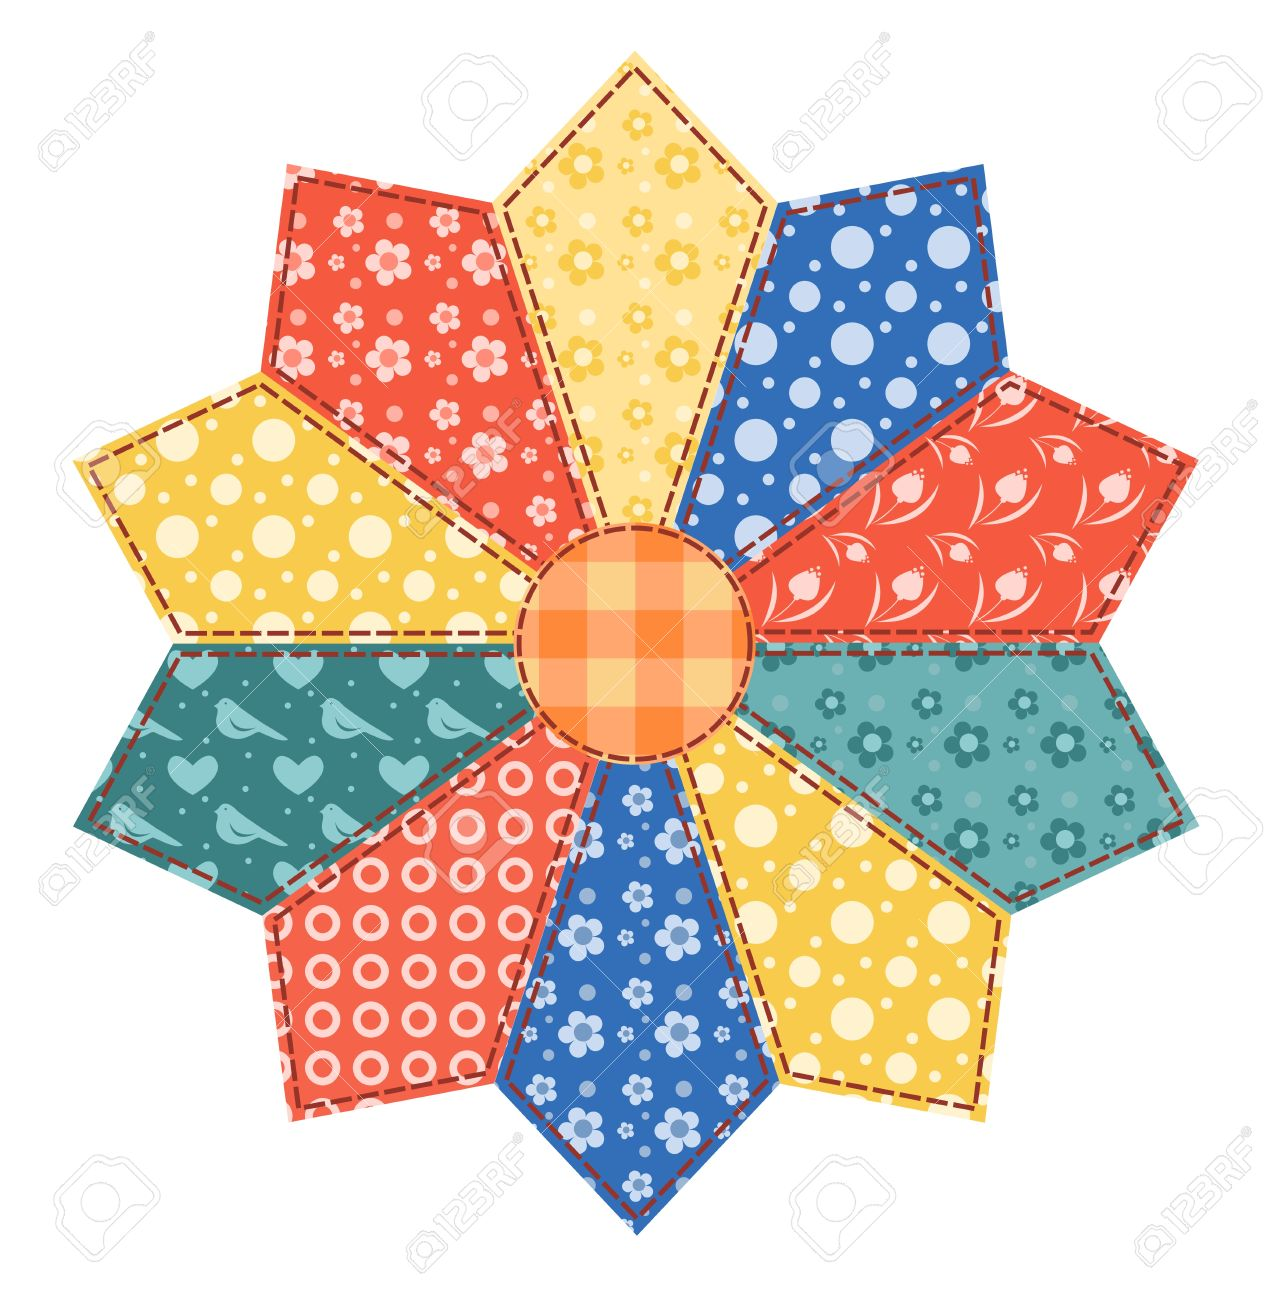 1279x1300 Blanket Clipart Patchwork Quilt